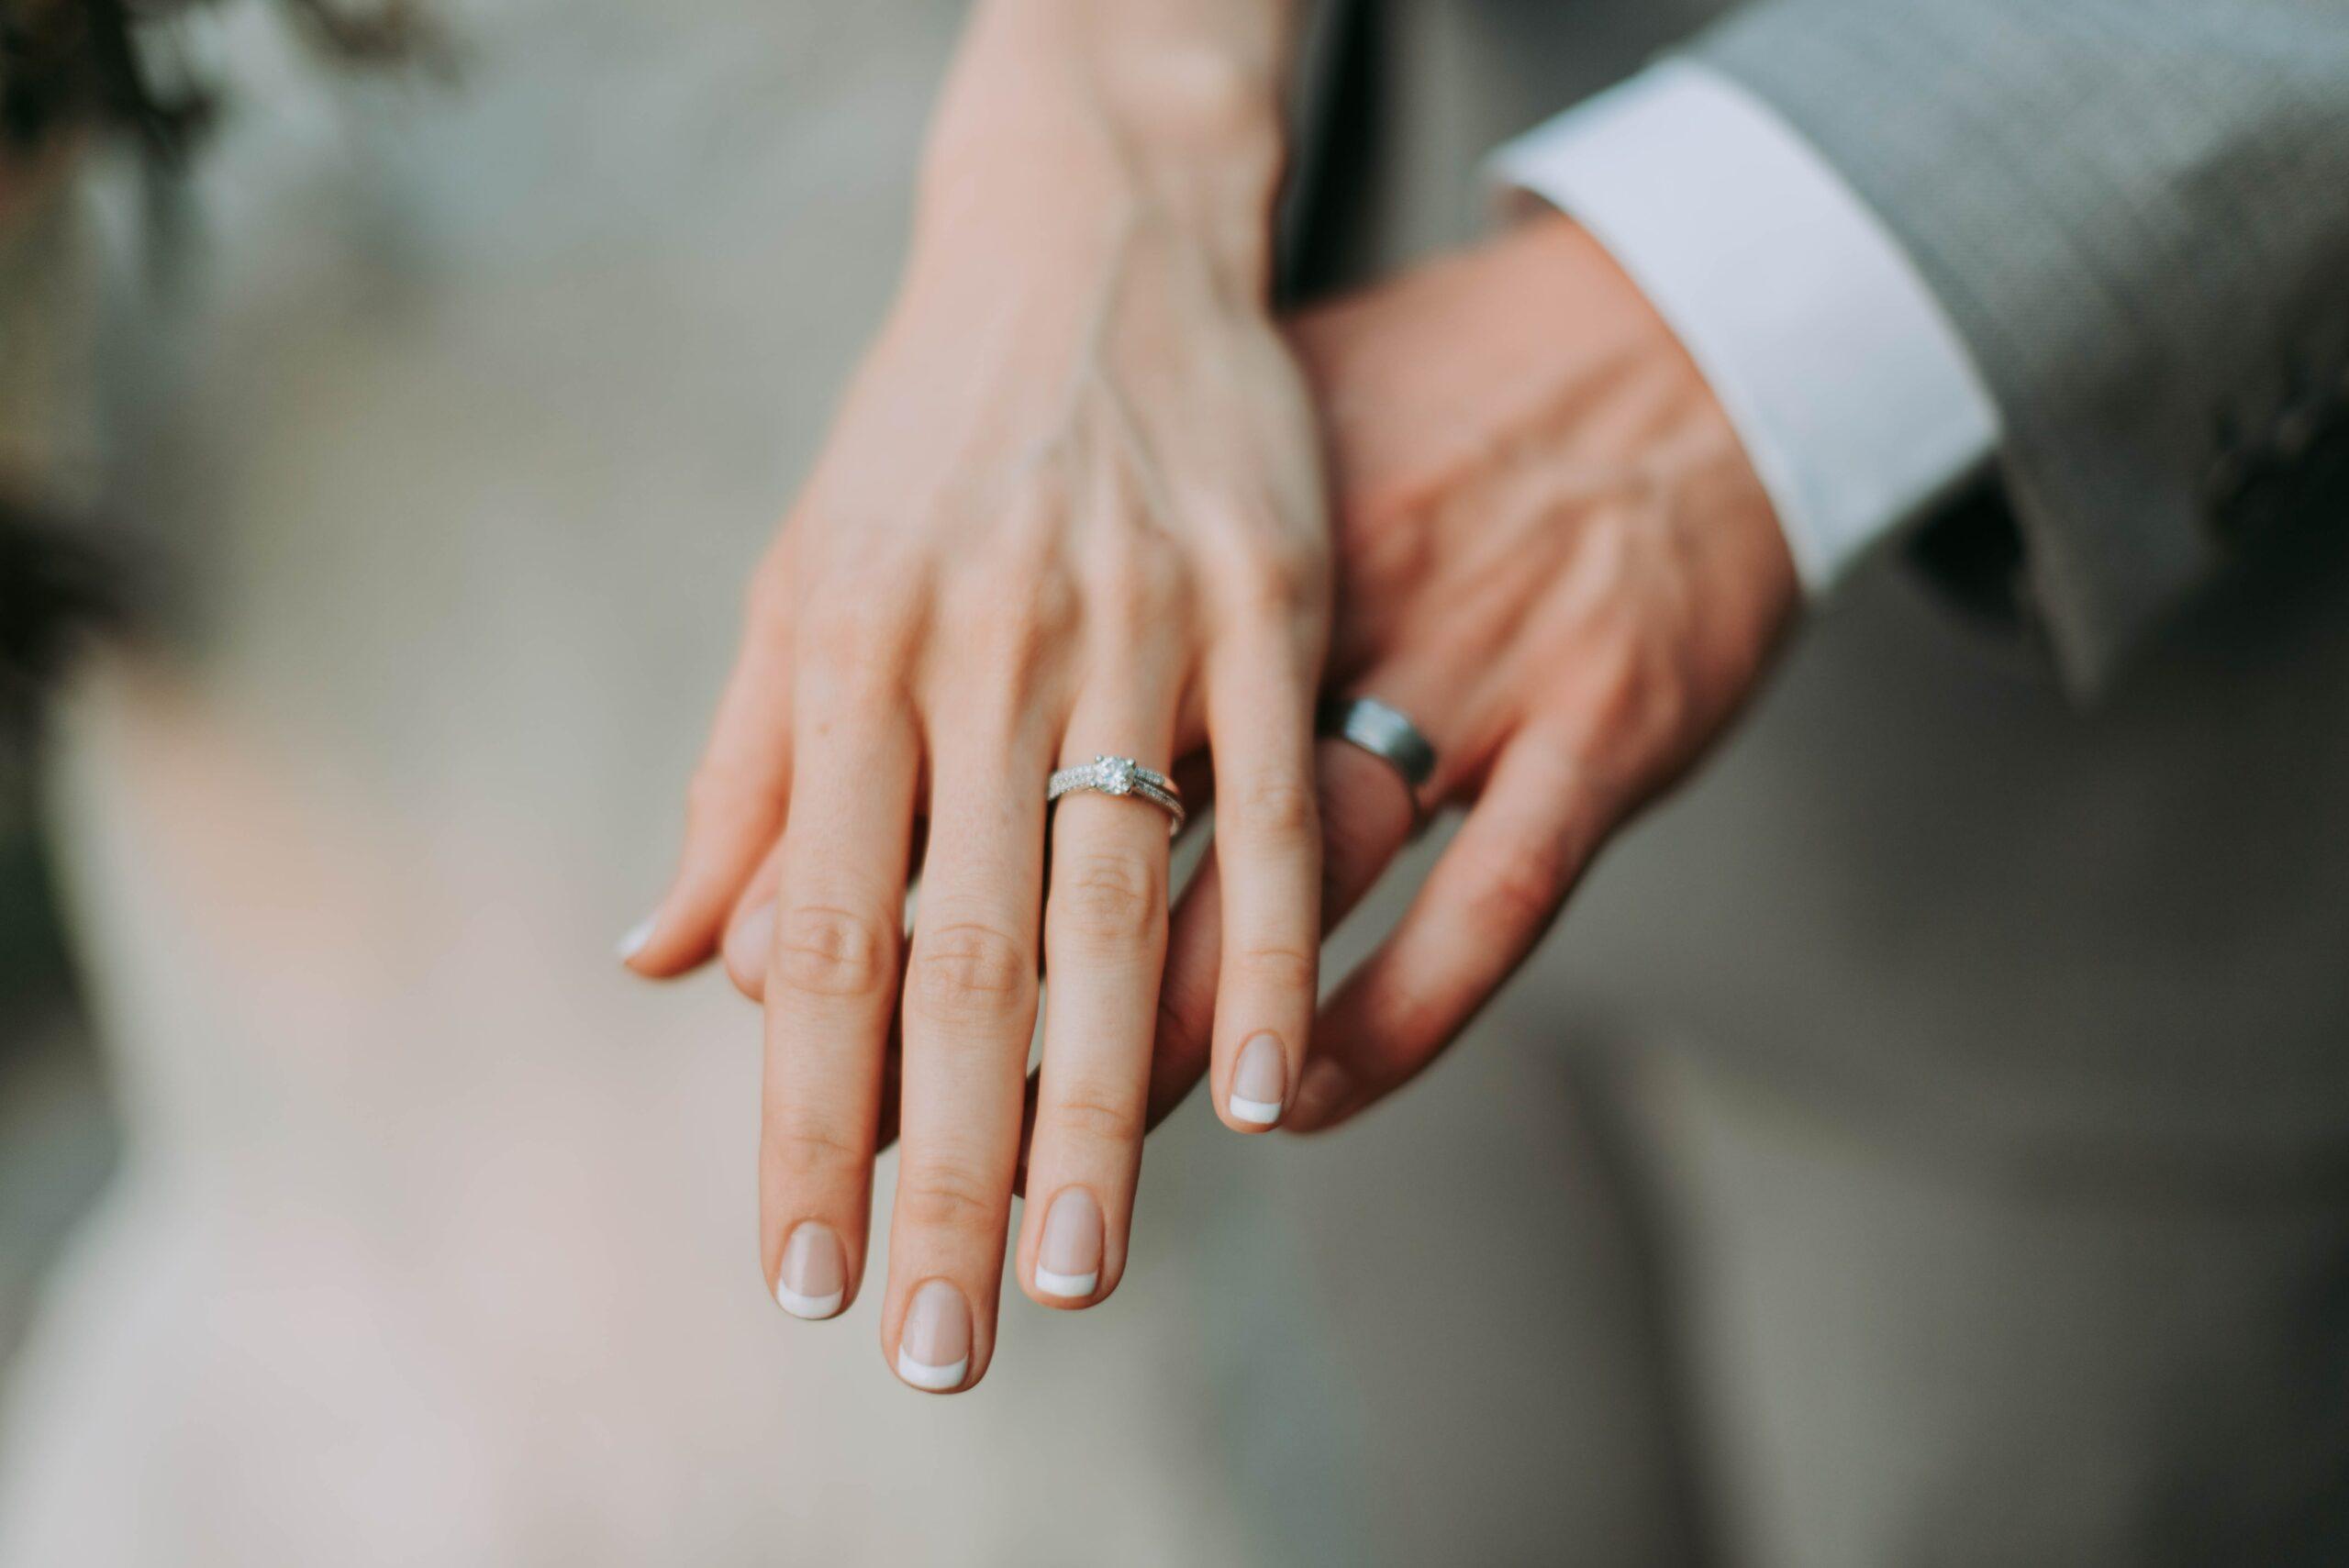 martesa tradicionale shqiptare biblike